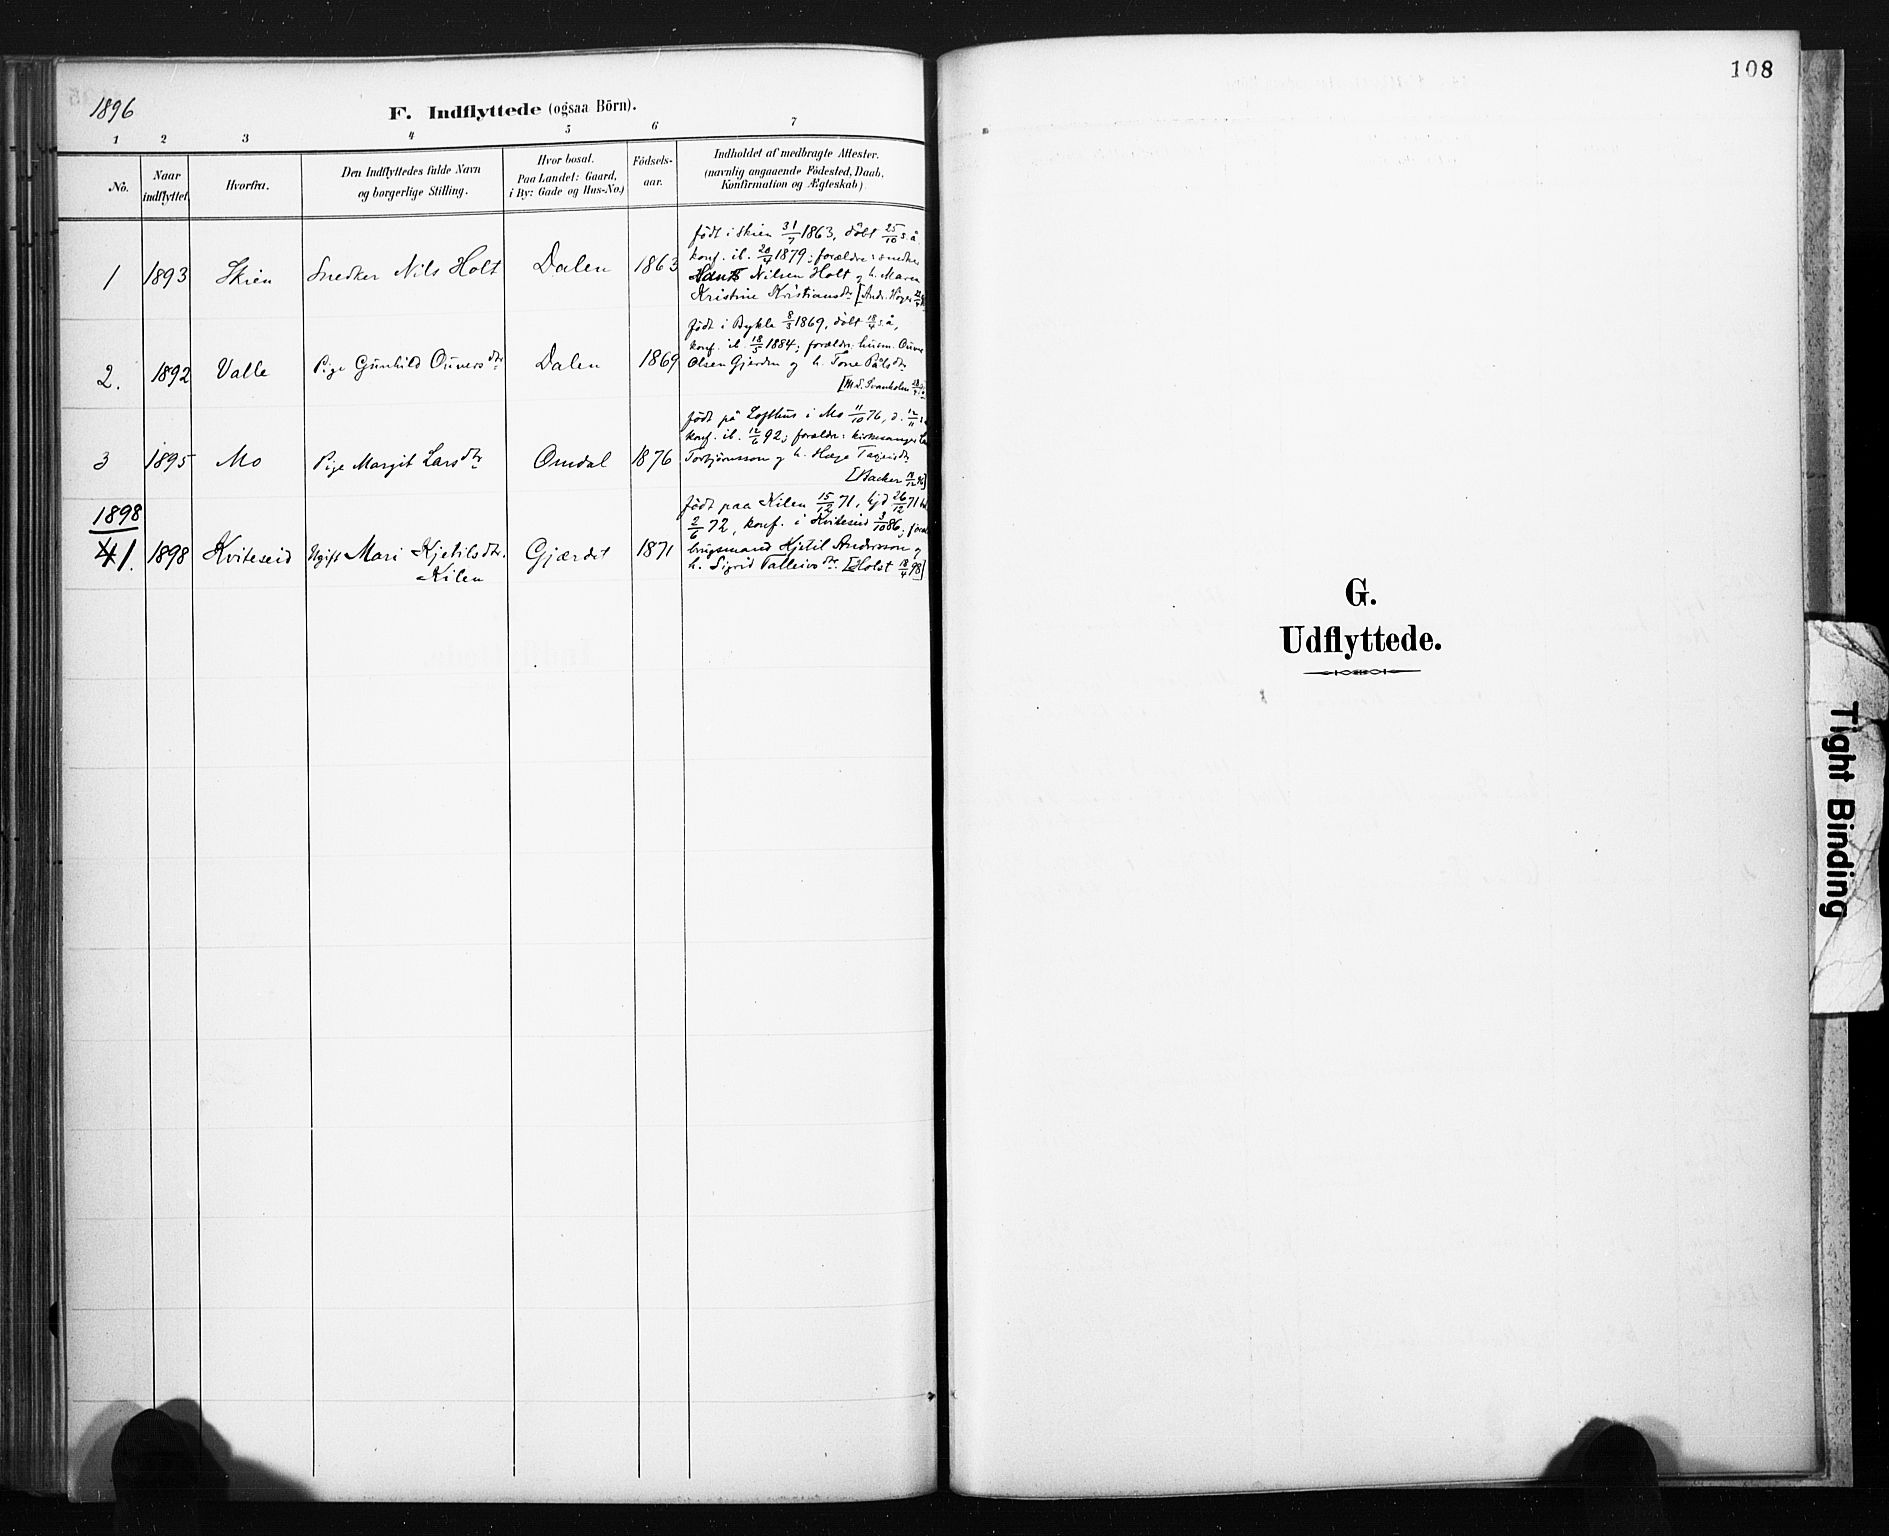 SAKO, Lårdal kirkebøker, F/Fb/L0002: Ministerialbok nr. II 2, 1887-1918, s. 108